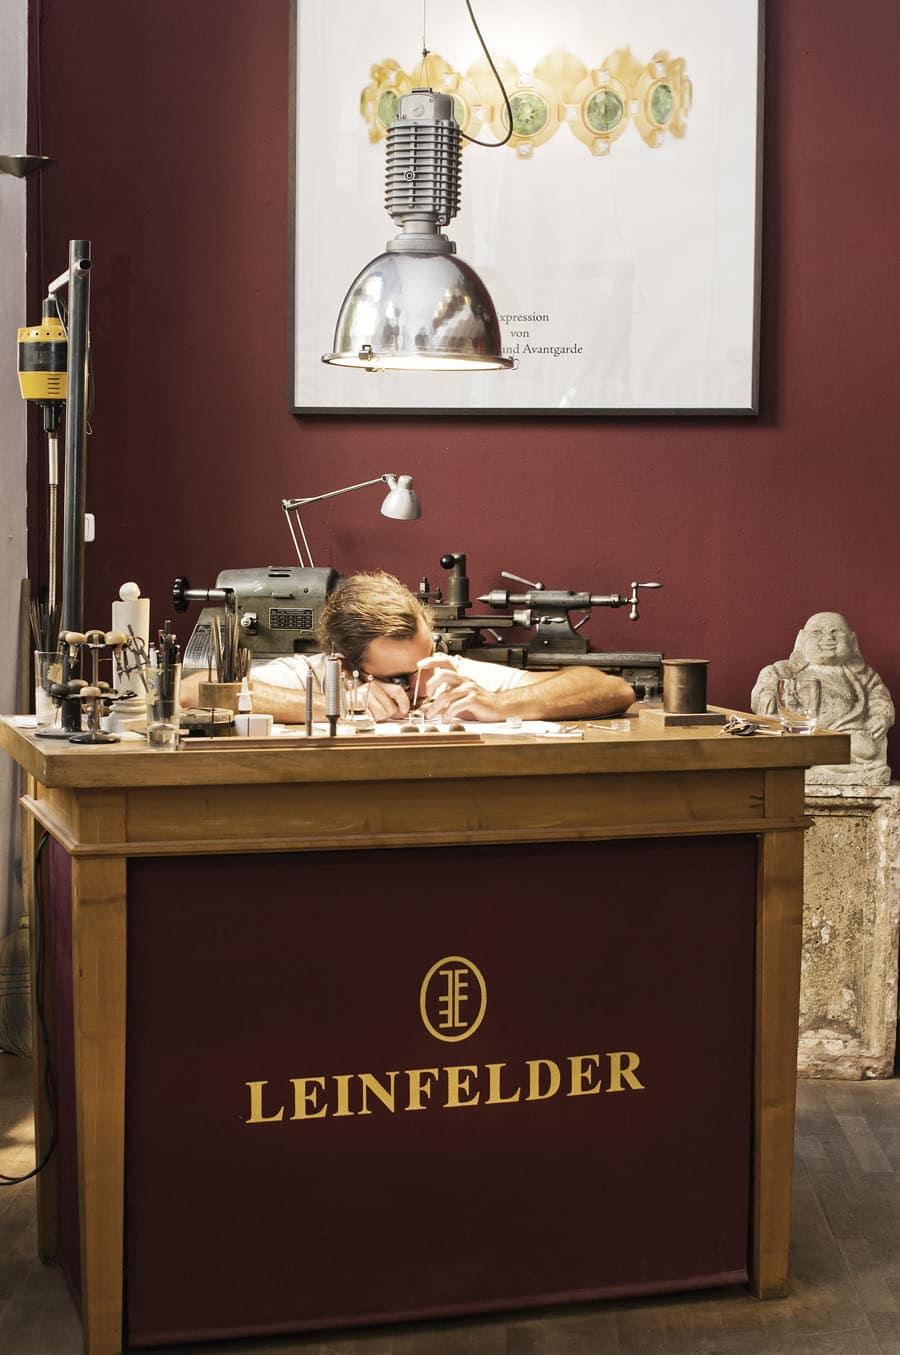 Leinfelder Uhren München: Manufaktur Made in Germany